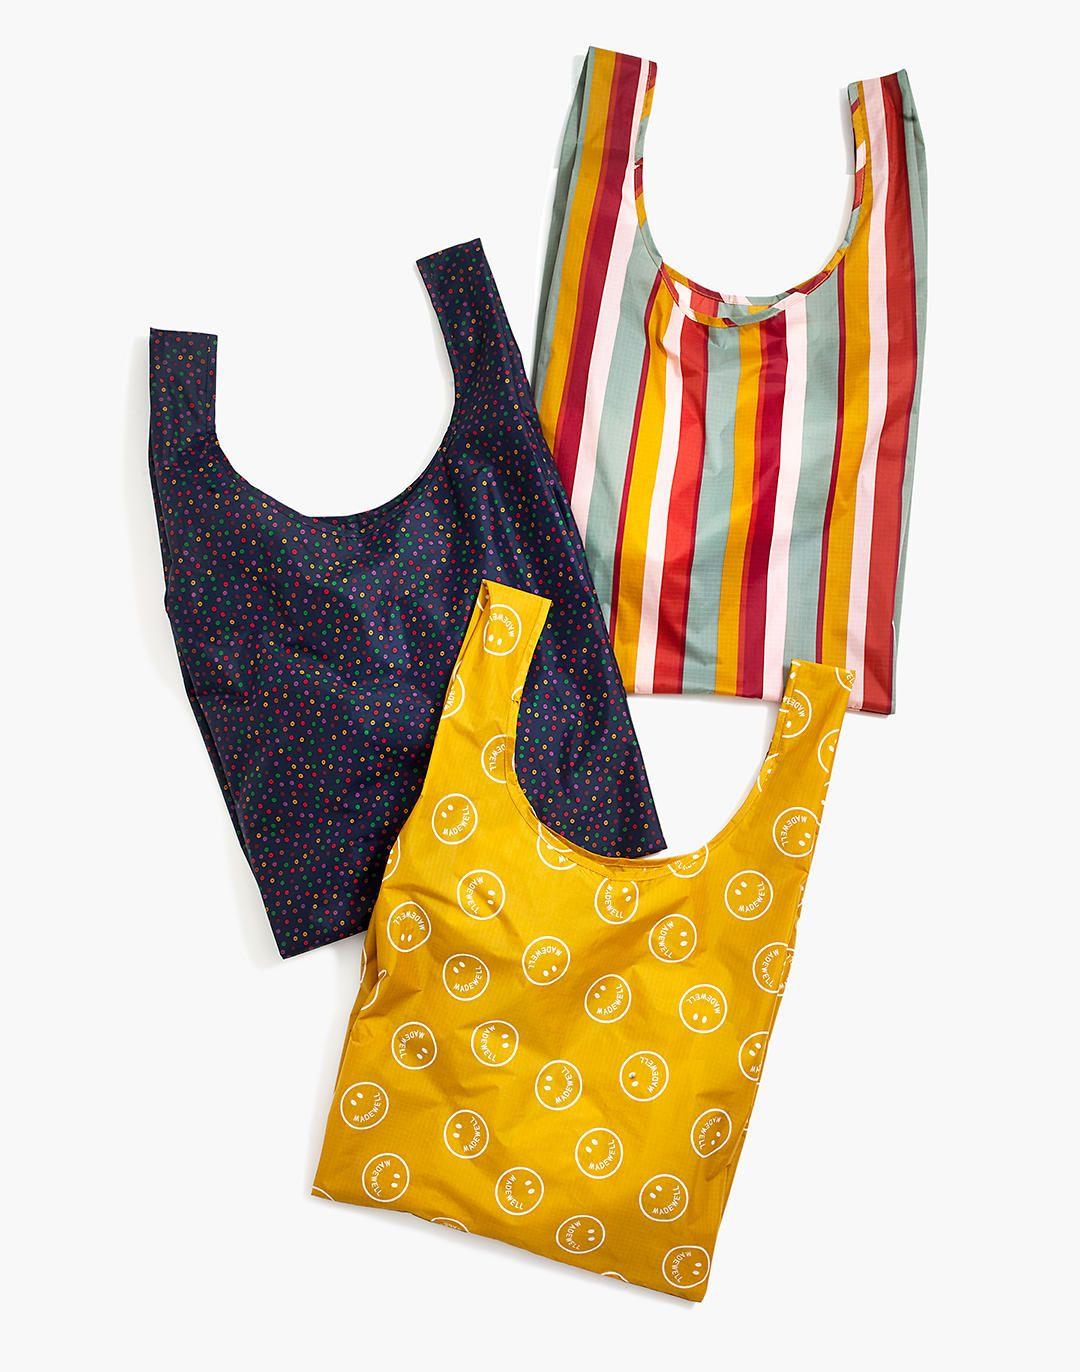 Madewell x Baggu® Three-Pack Reusable Bags